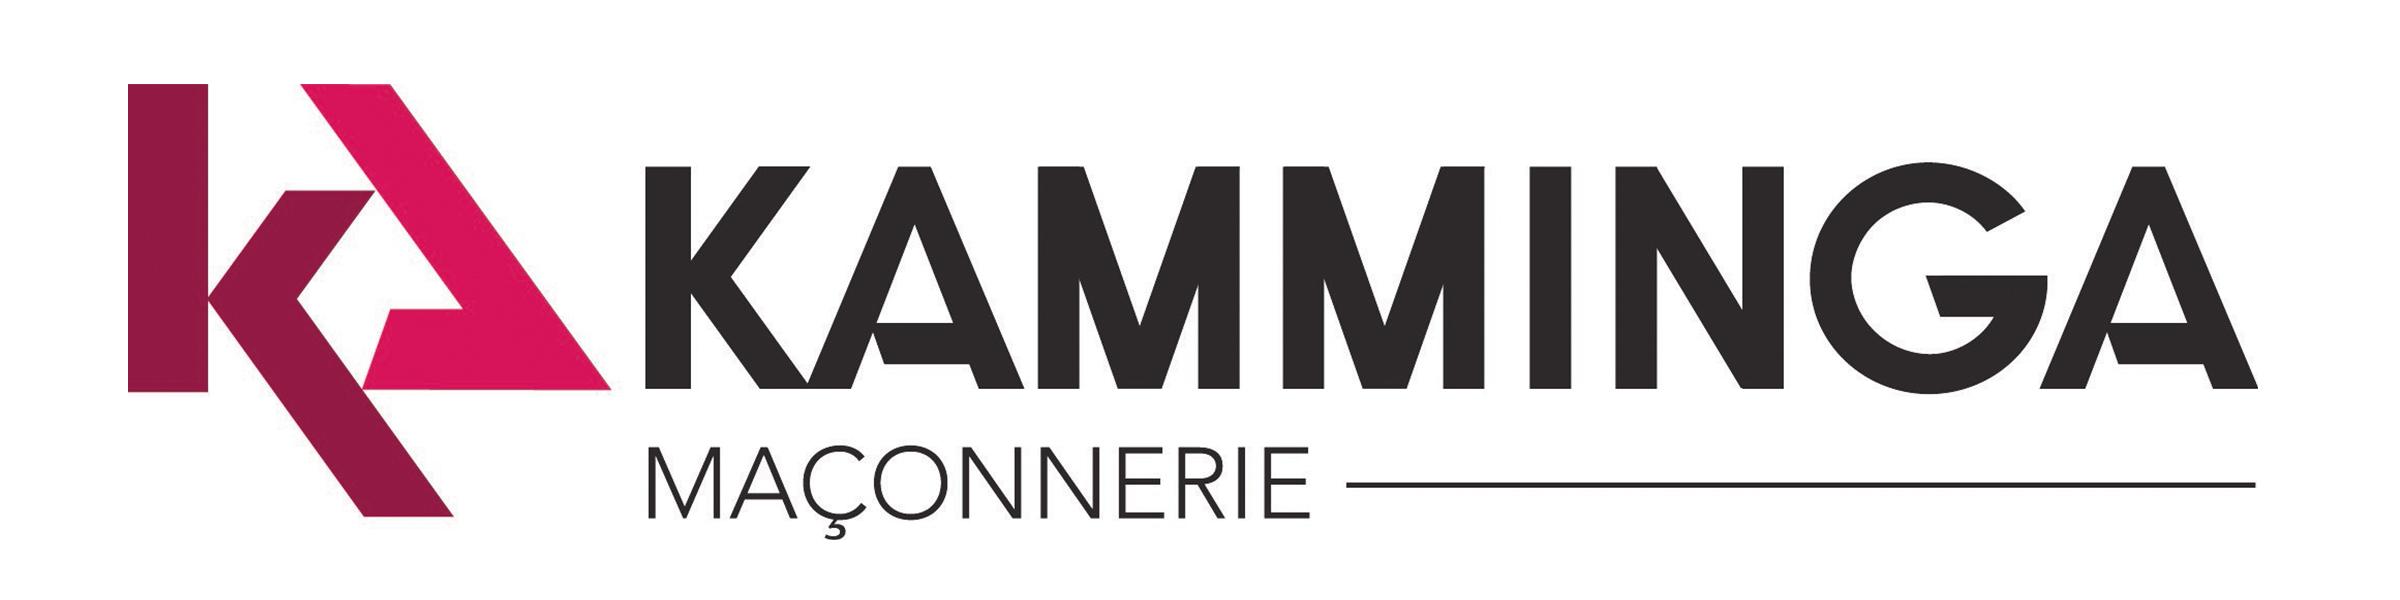 https://www.kamminga-maconnerie.com/w2018/wp-content/uploads/2017/01/Logo-CONTOUR-BLANC.jpg